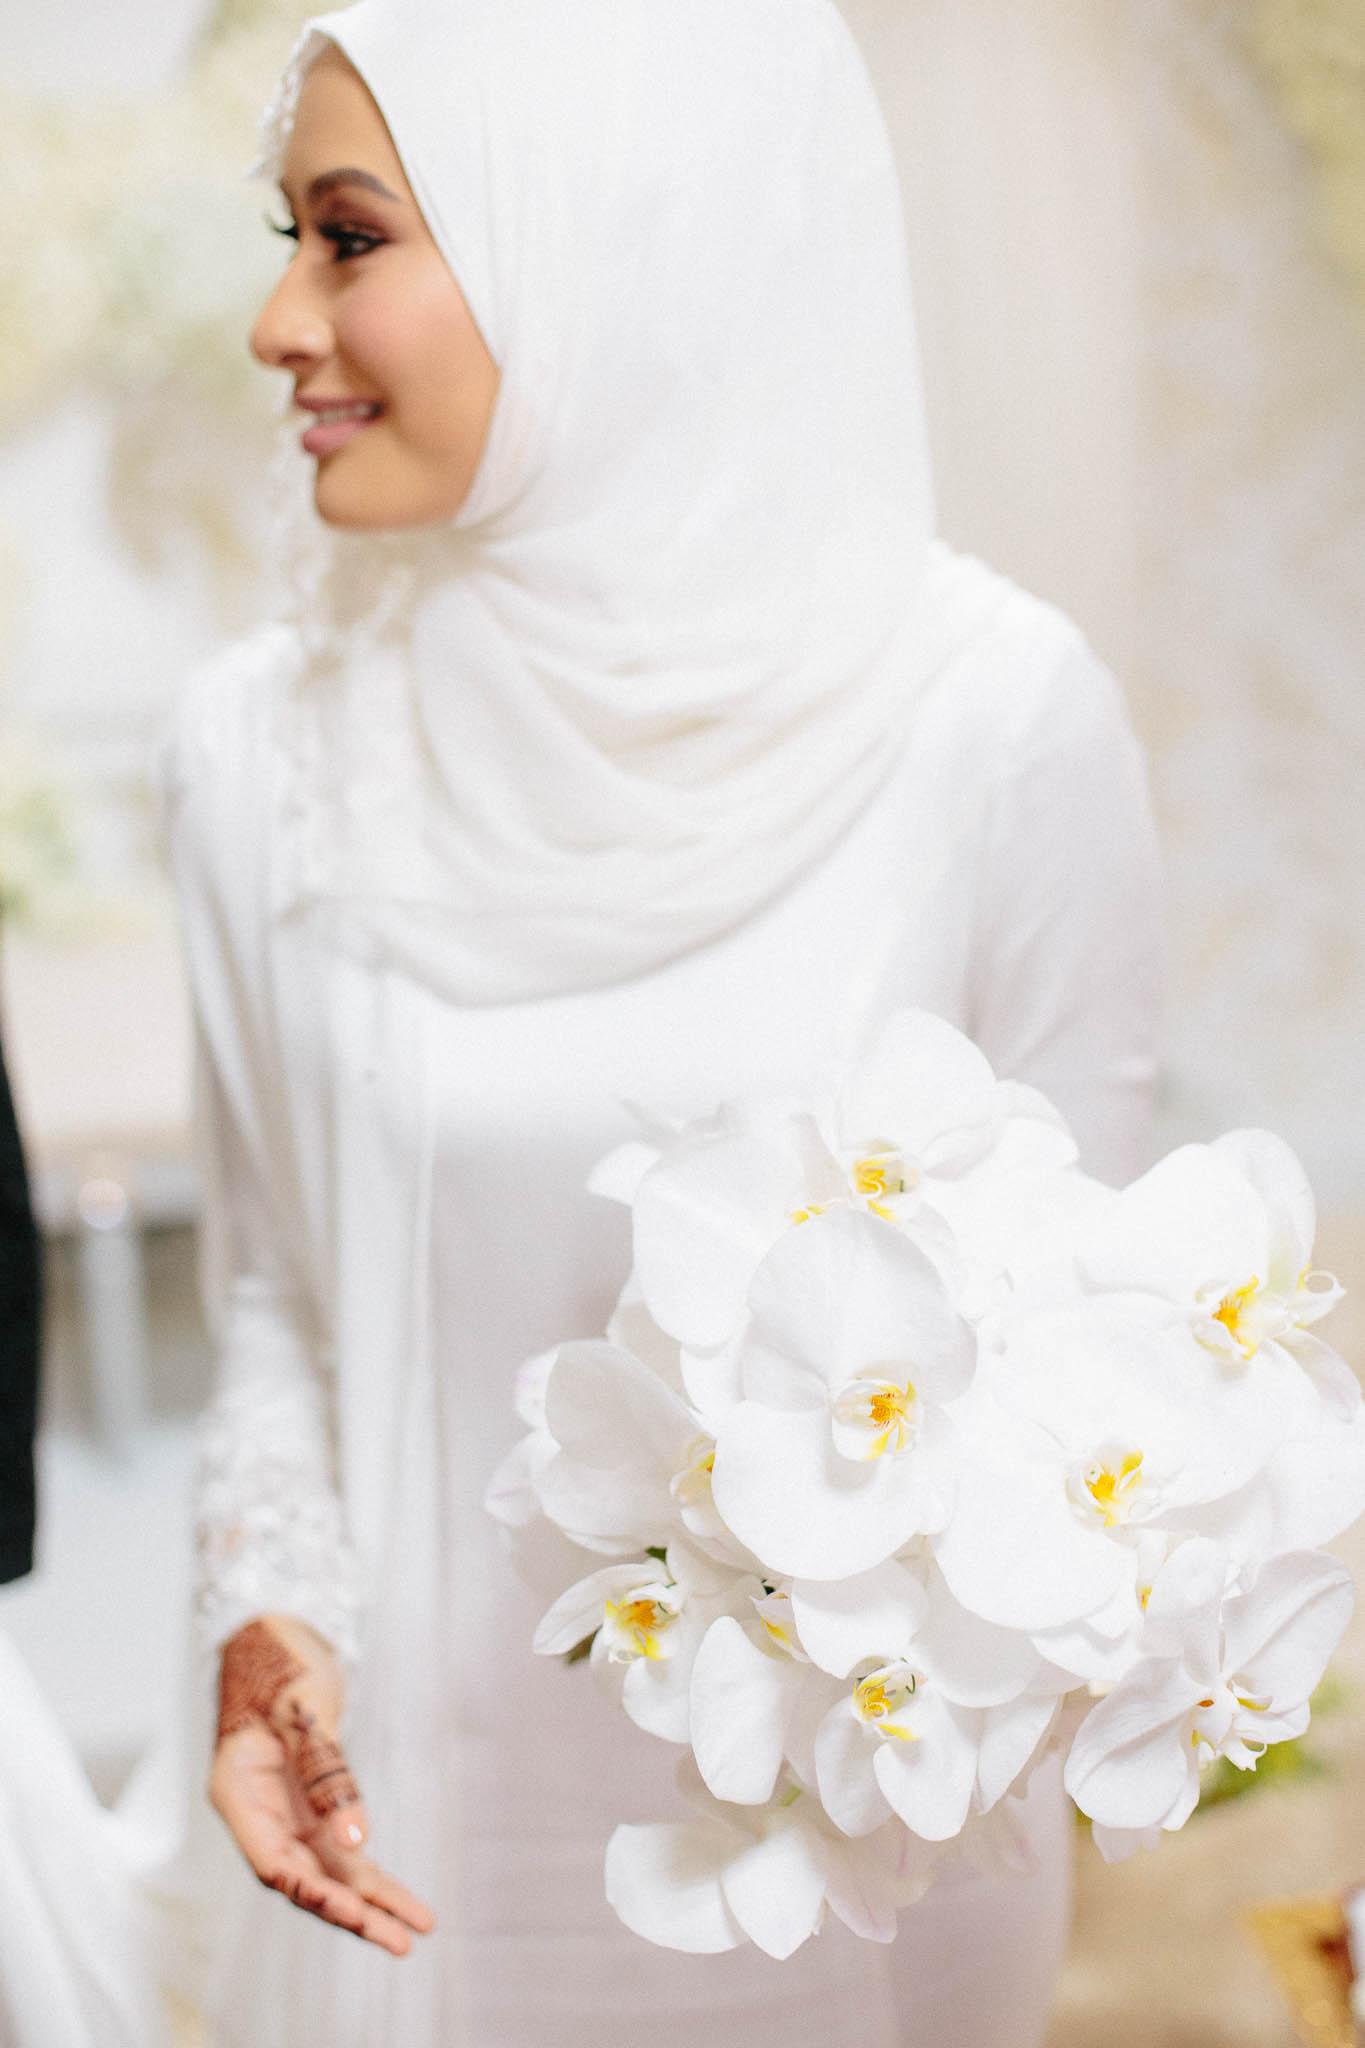 singapore-wedding-photographer-sarah-razif-40.jpg